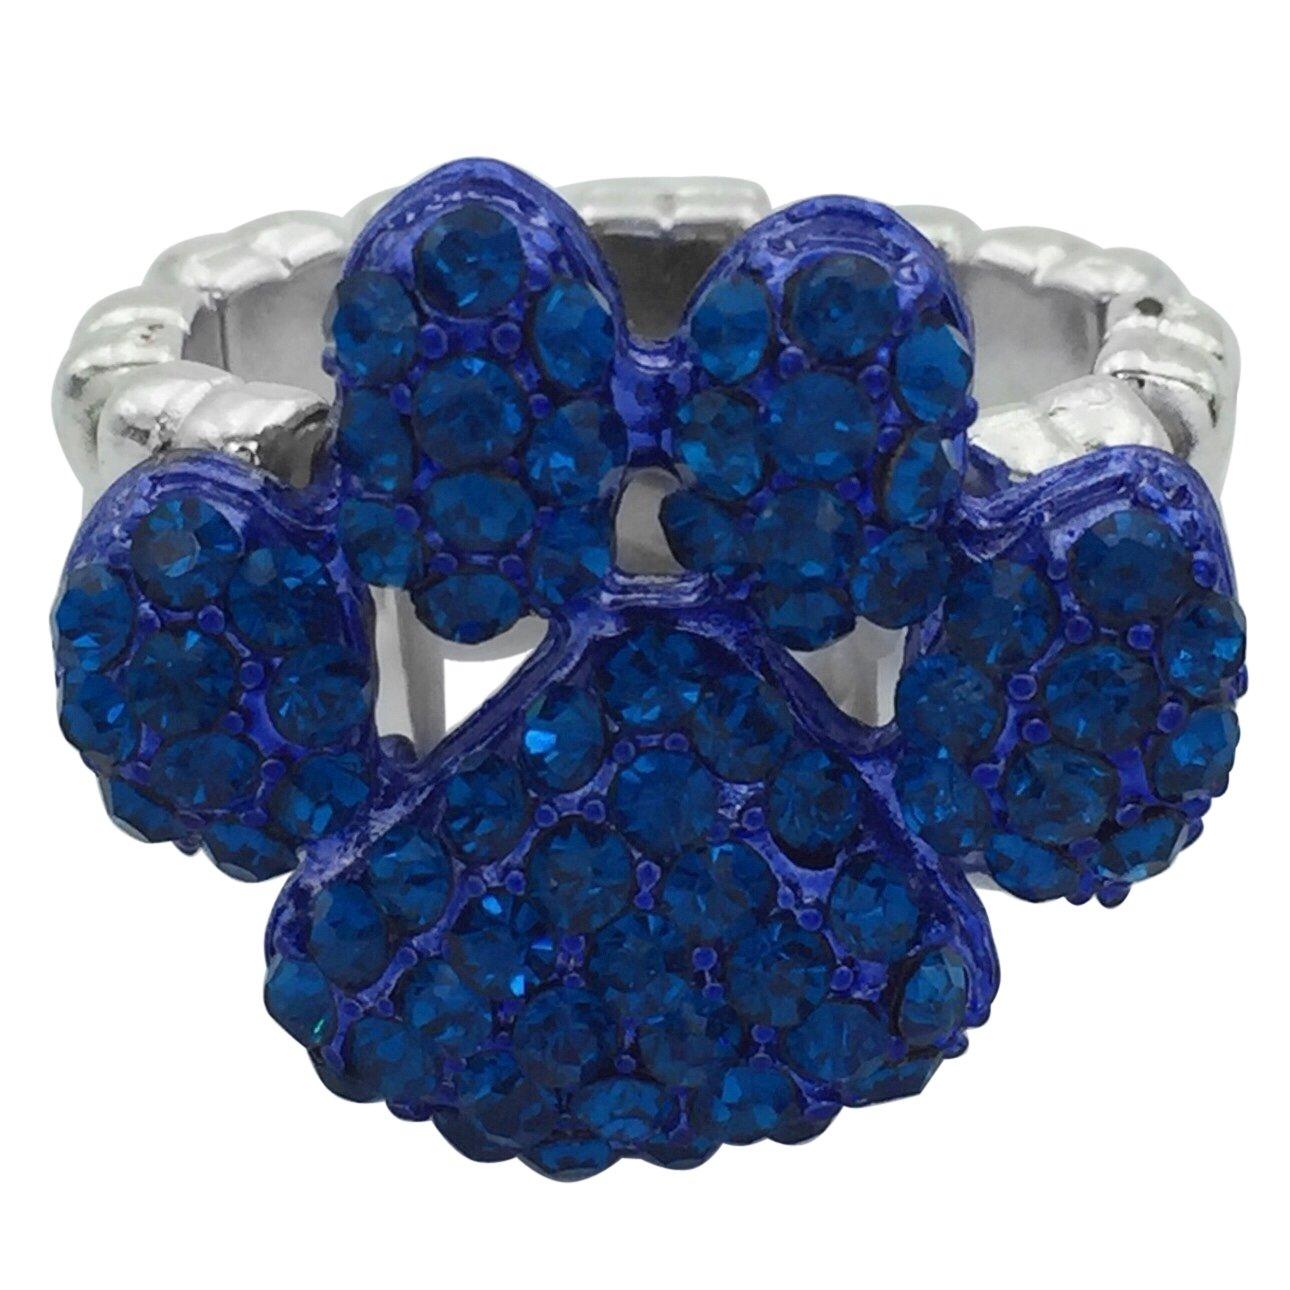 Gypsy Jewels Paw Print School Spirit Mascot Silver Tone Rhinestone Stretch Ring - Assorted Colors